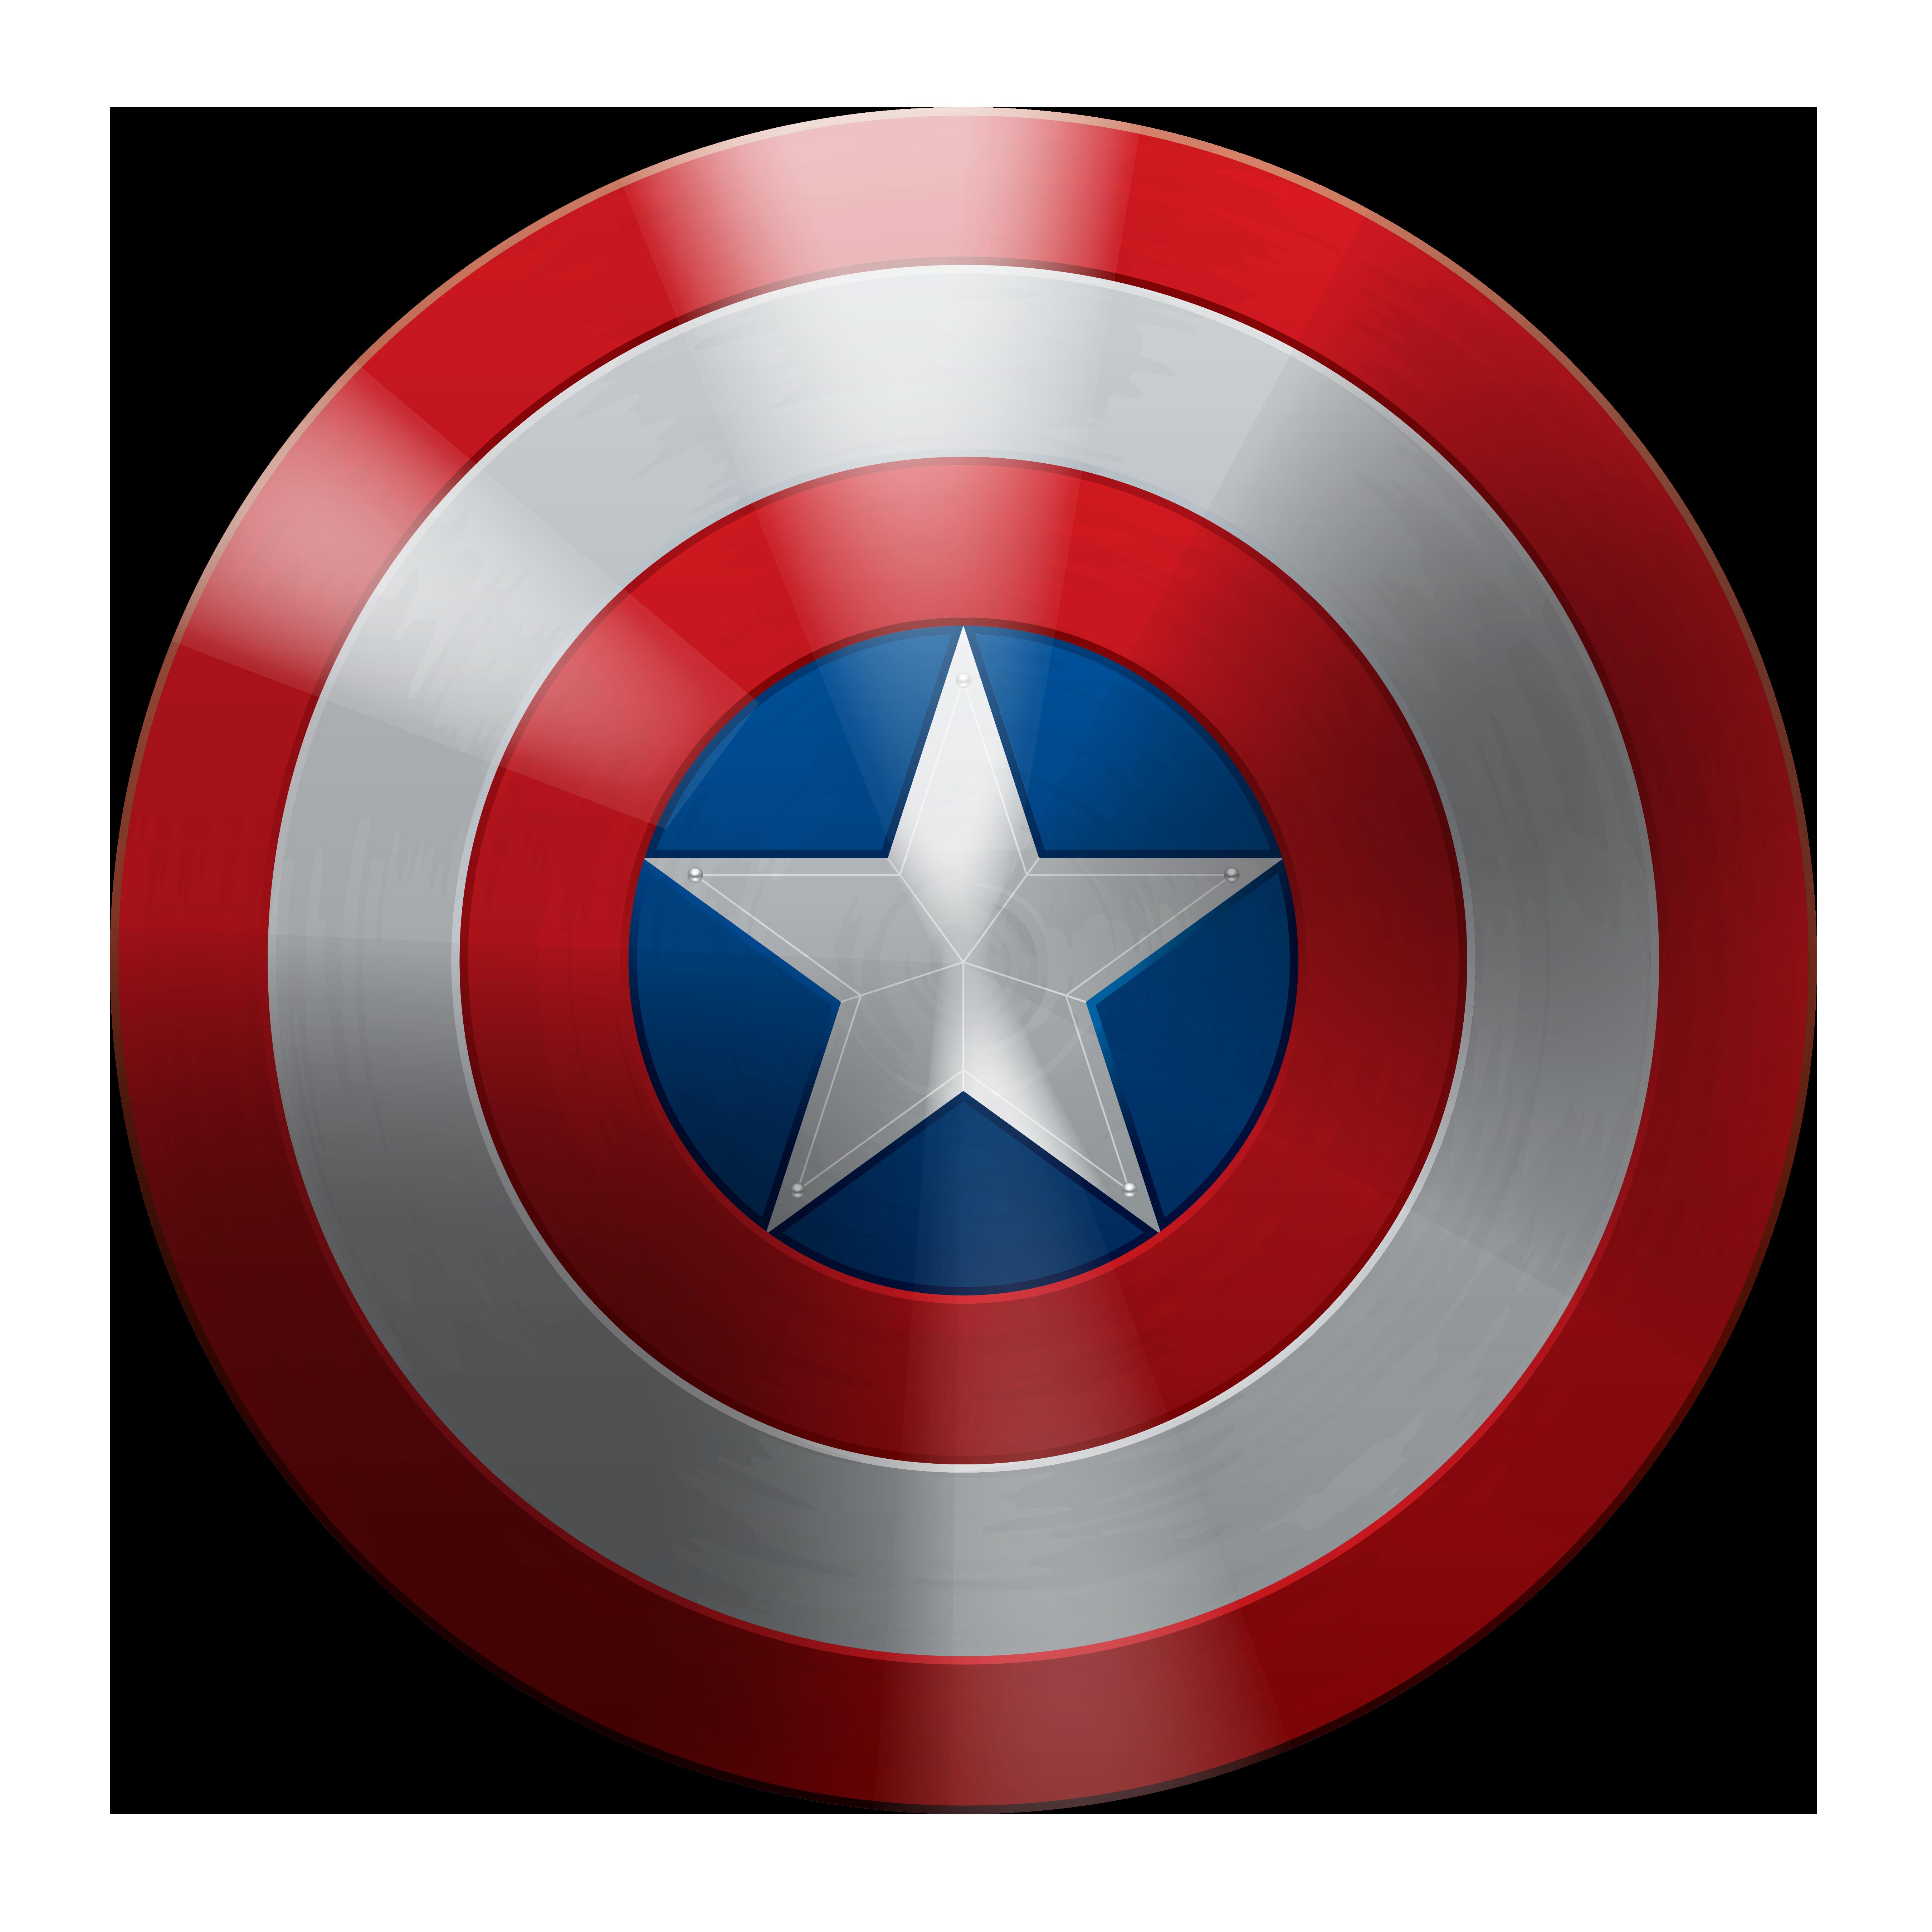 Captian americas sheild clipart image library library Captain America Clipart | Free download best Captain America Clipart ... image library library